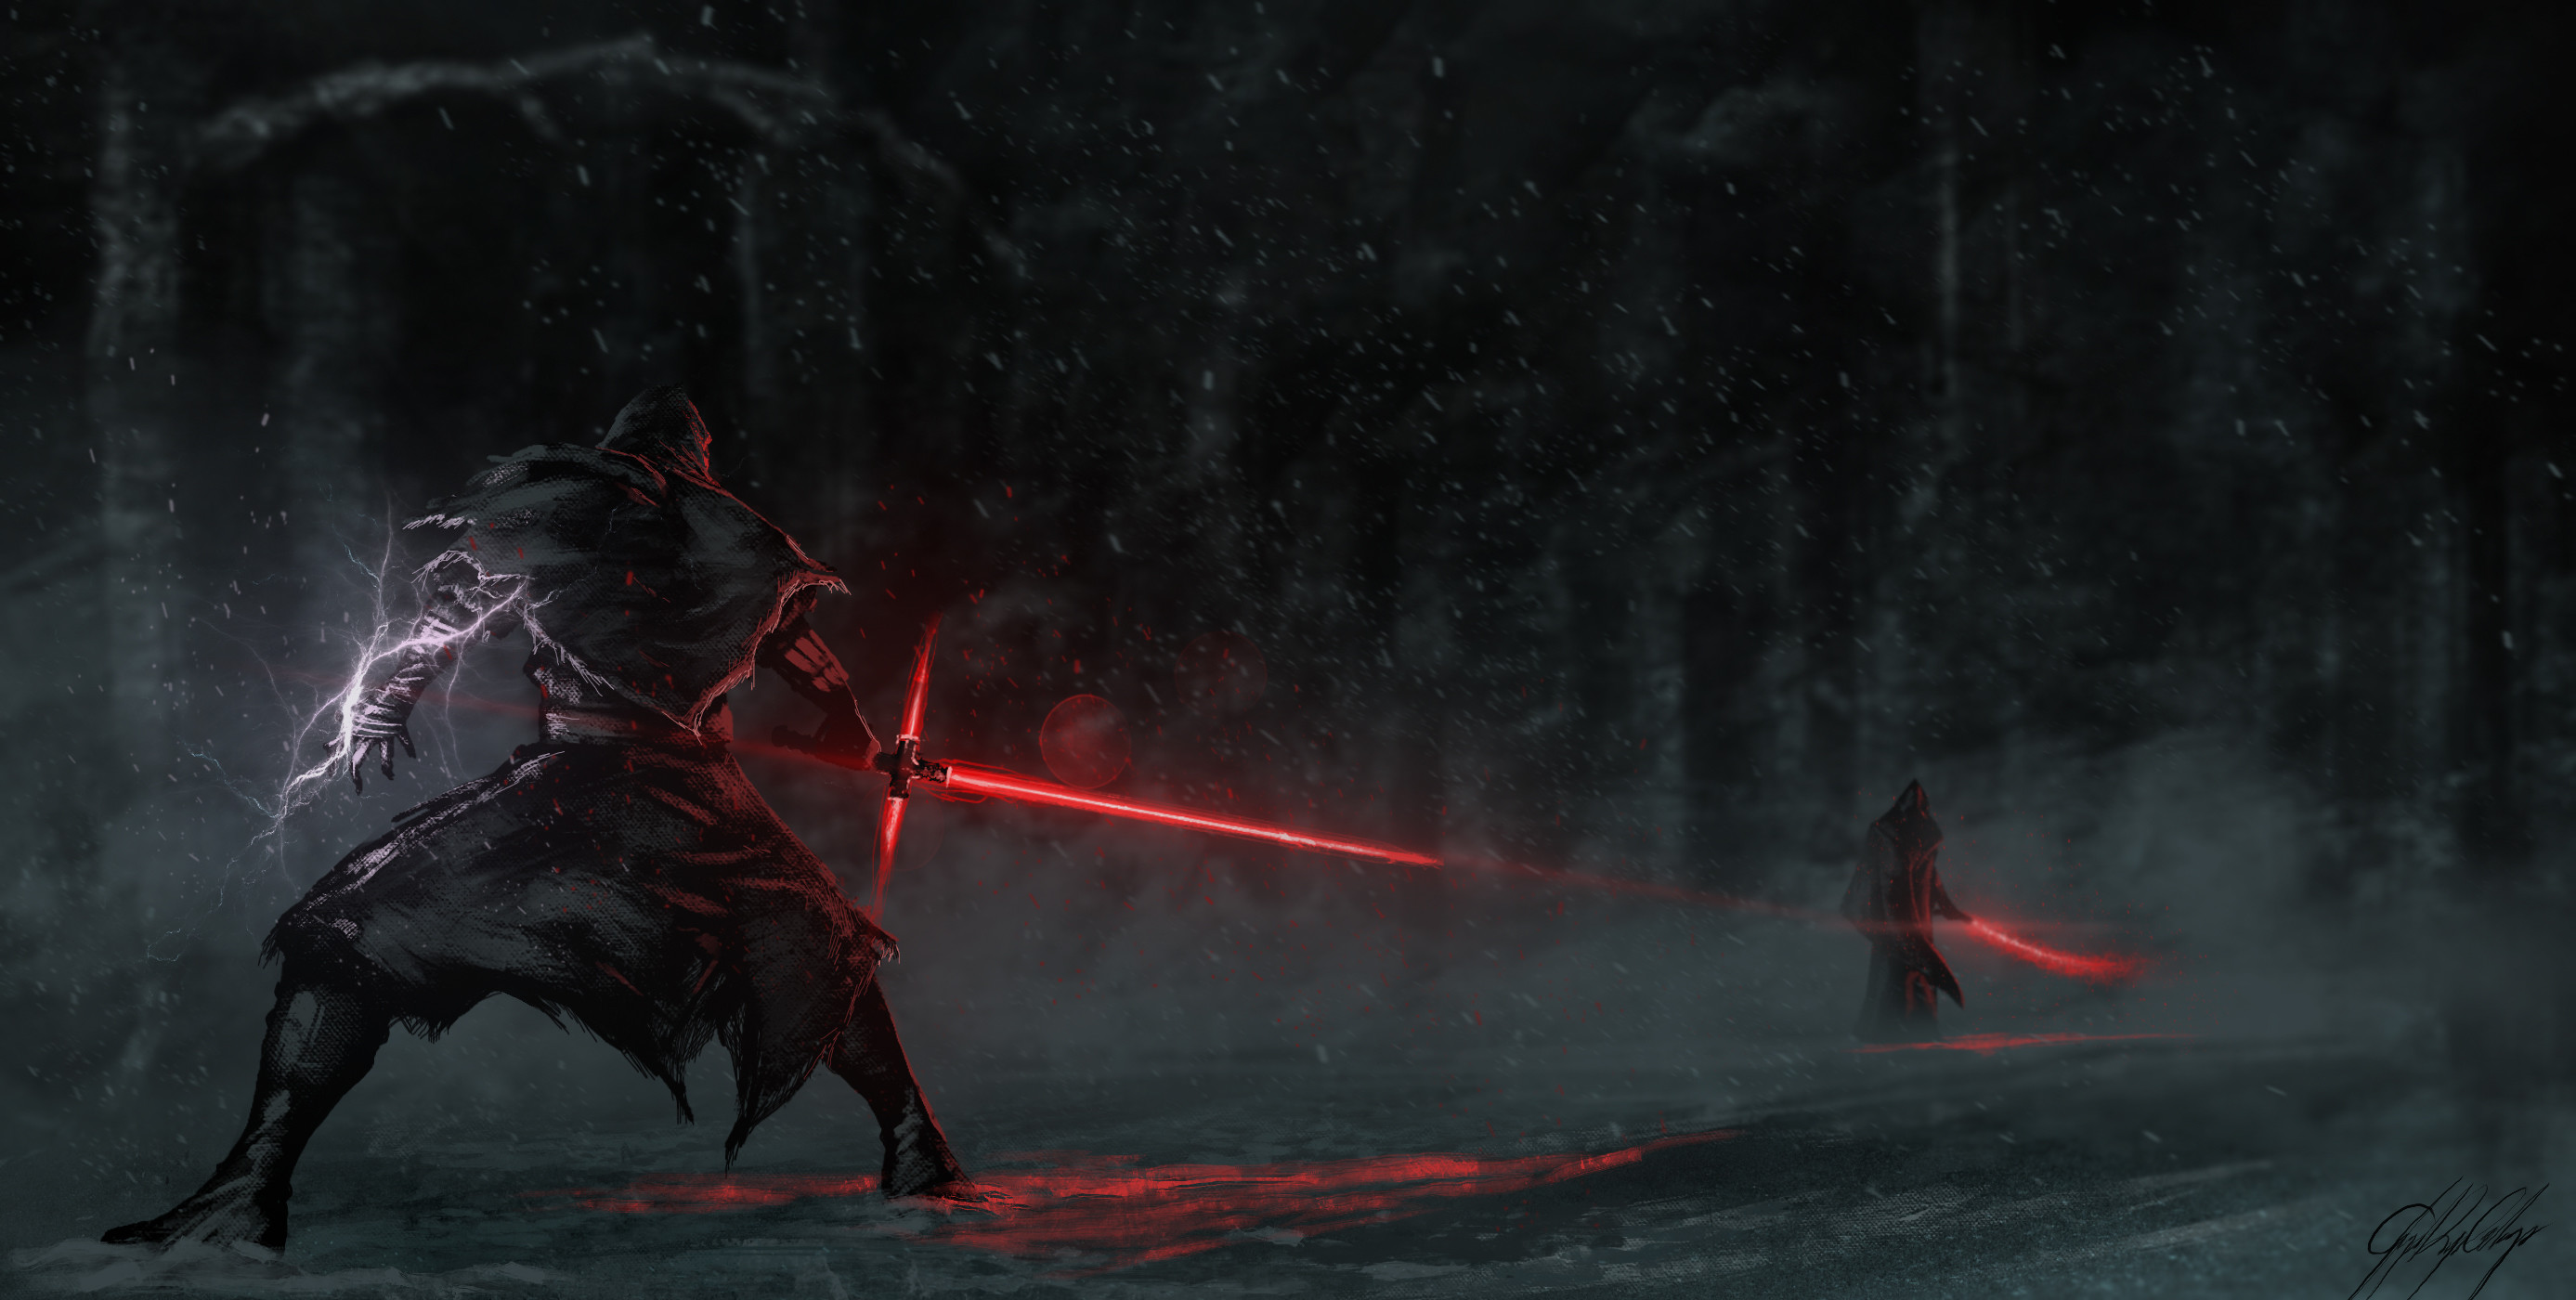 Movie Star Wars Episode VII: The Force Awakens Star Wars Lightsaber Kylo  Ren Wallpaper